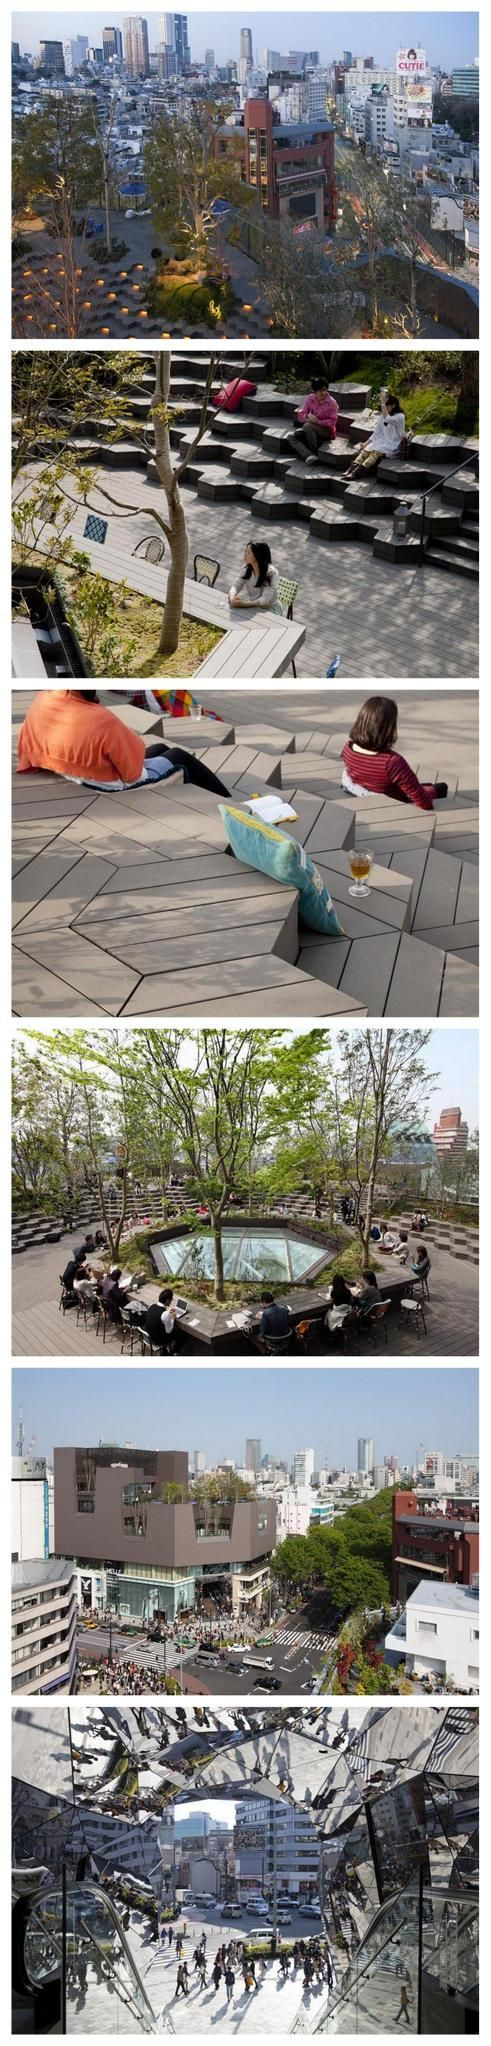 Hiroshi Nakamura, Tokyo Plaza Omotesando Project. Click image for link to full profile and visit the slowottawa.ca boards >> https://www.pinterest.com/slowottawa/